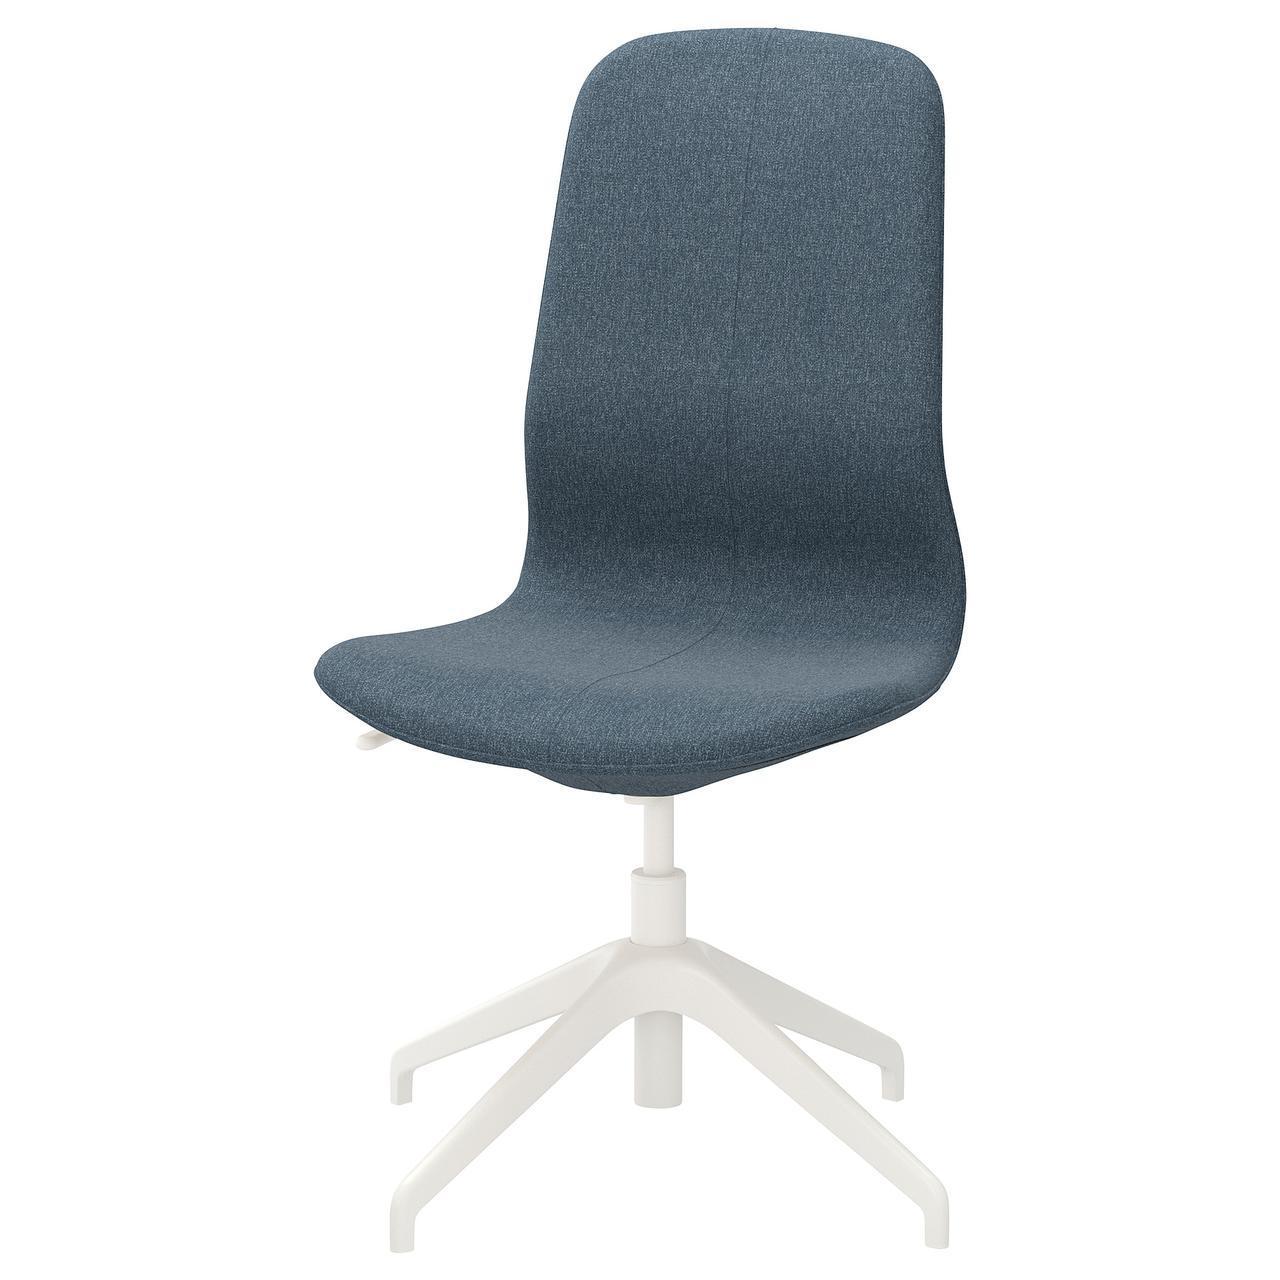 IKEA LANGFJALL (192.523.47) Компьютерное кресло, Гуннаред темно-серый